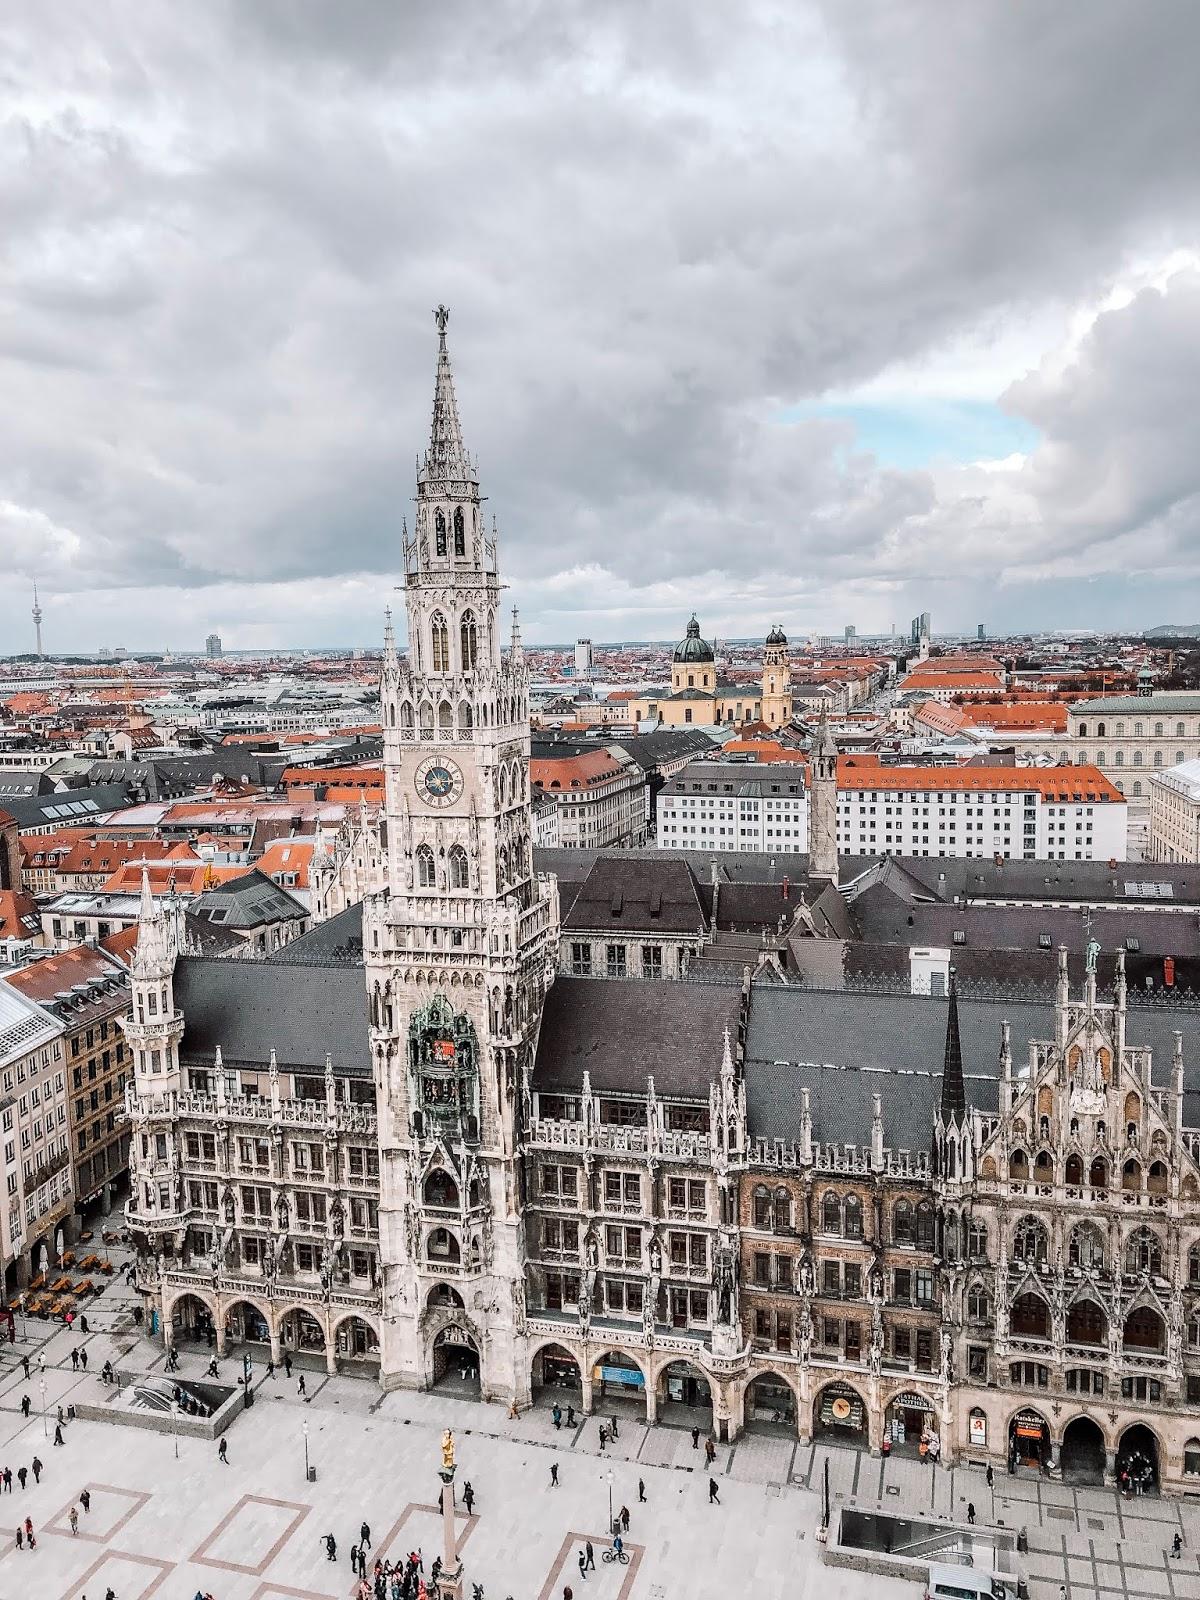 Marienplatz is the city sqaure of Munich, Germany